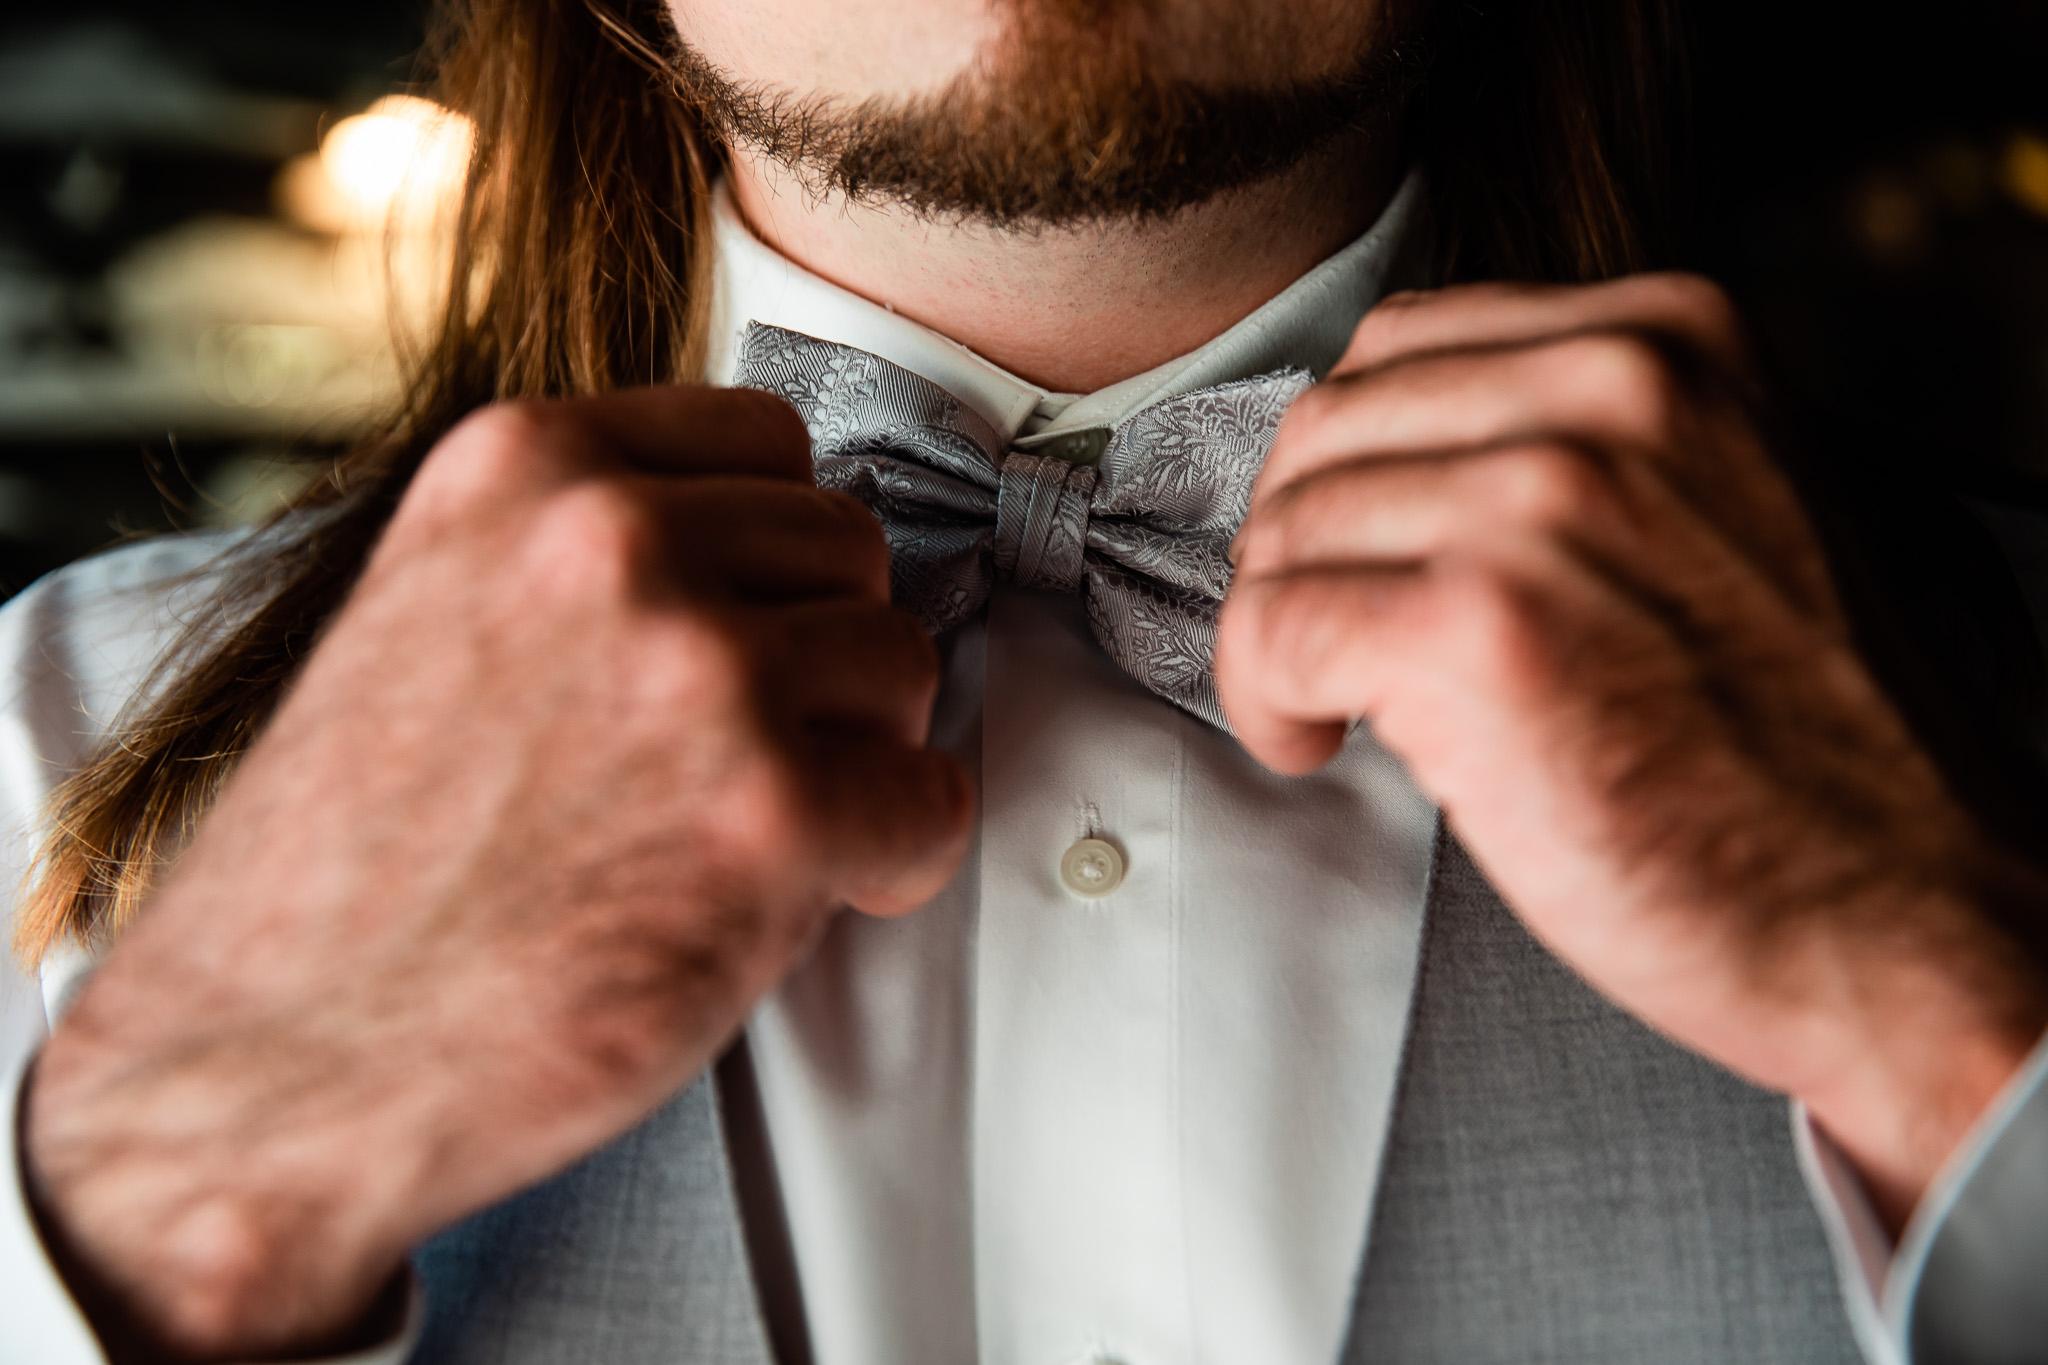 TAMPA_WEDDING_GIGIS_COUNTRY_GARDEN_CJMZ_TJP48132.jpg